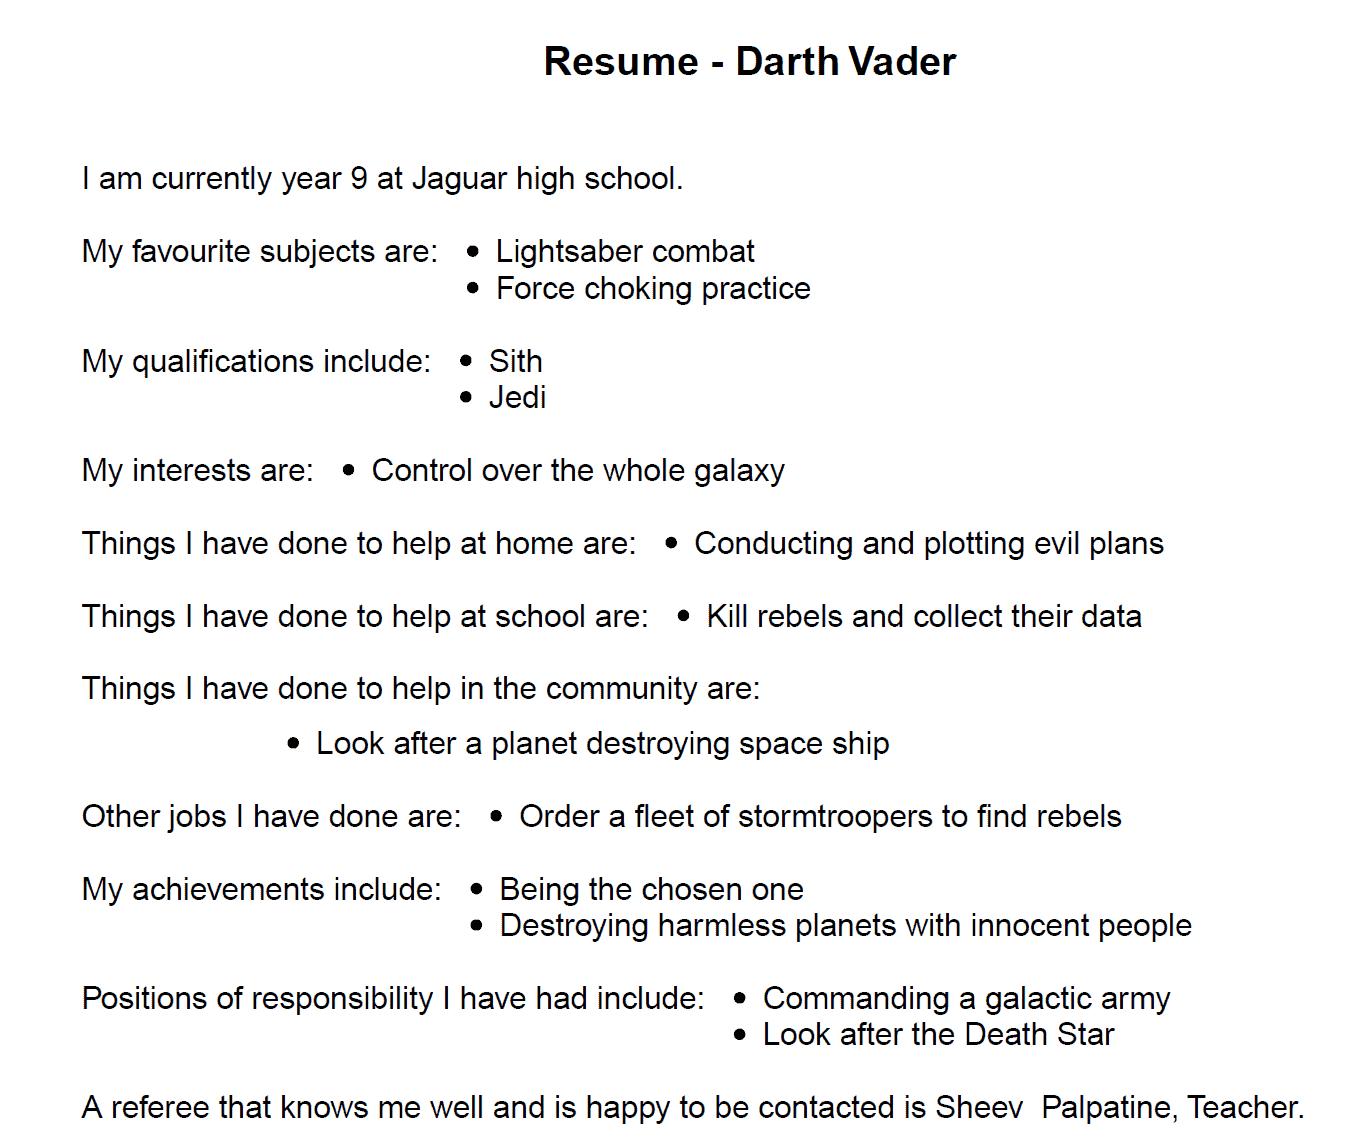 MoneyTime Resume example #darthvader #resume